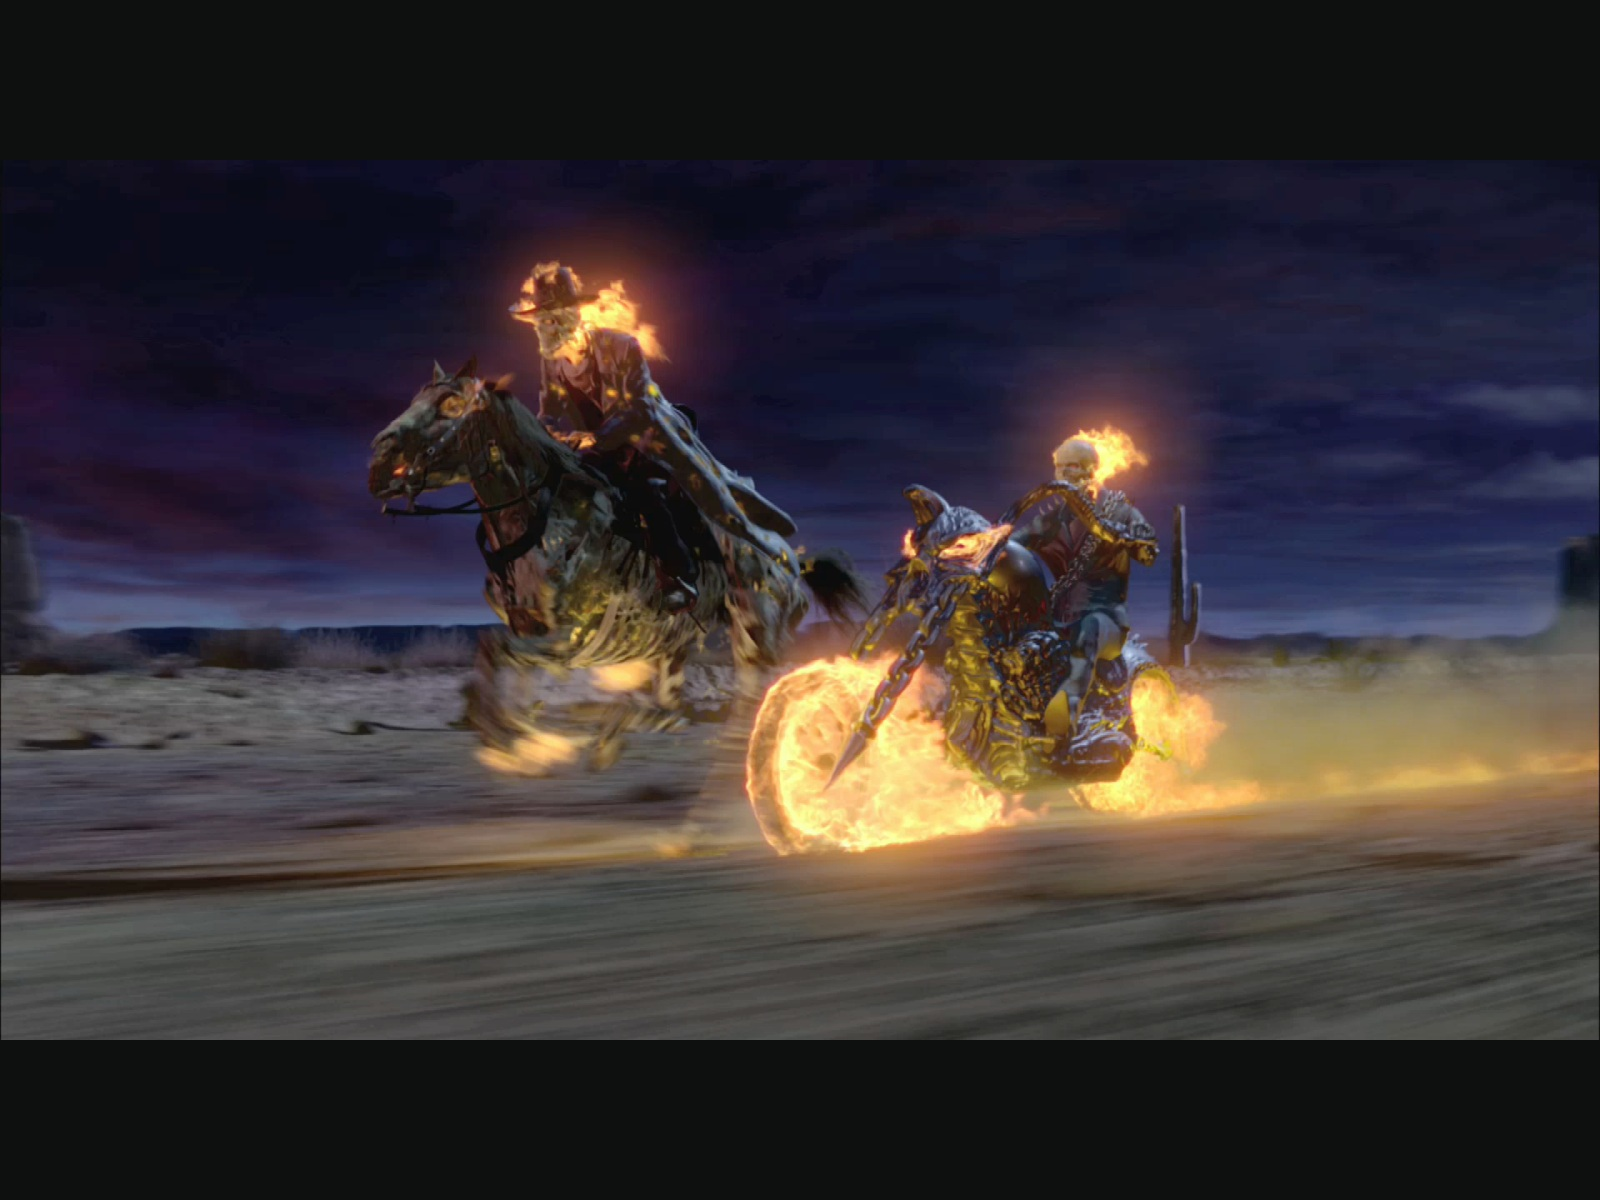 for forums [urlhttpwwwdesivalleycomghost rider hd wallpaper 1600x1200